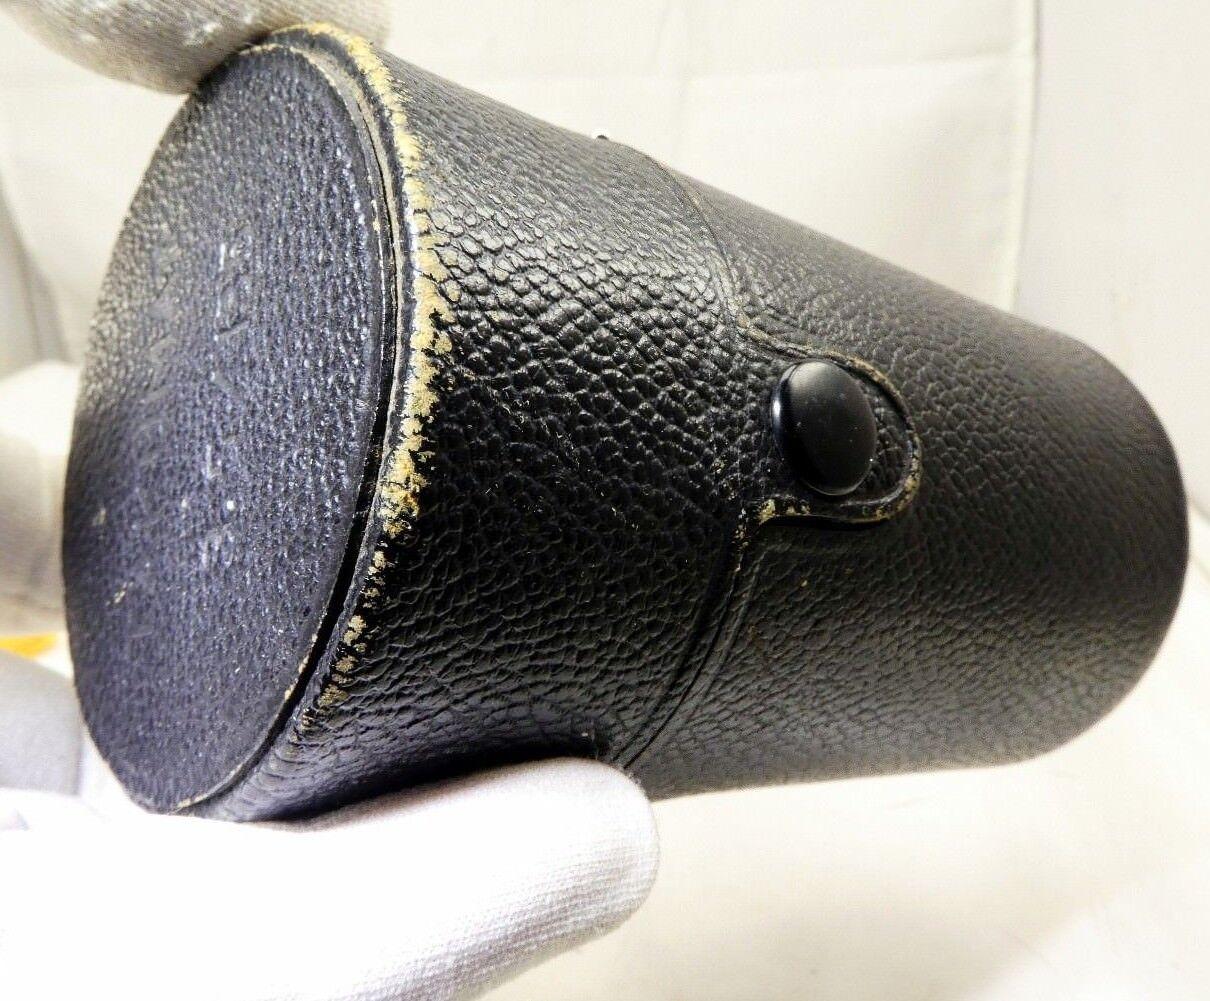 Case for Takumar Pentax f3.5/ 135mm Black Lens - Japan m42 screw mount